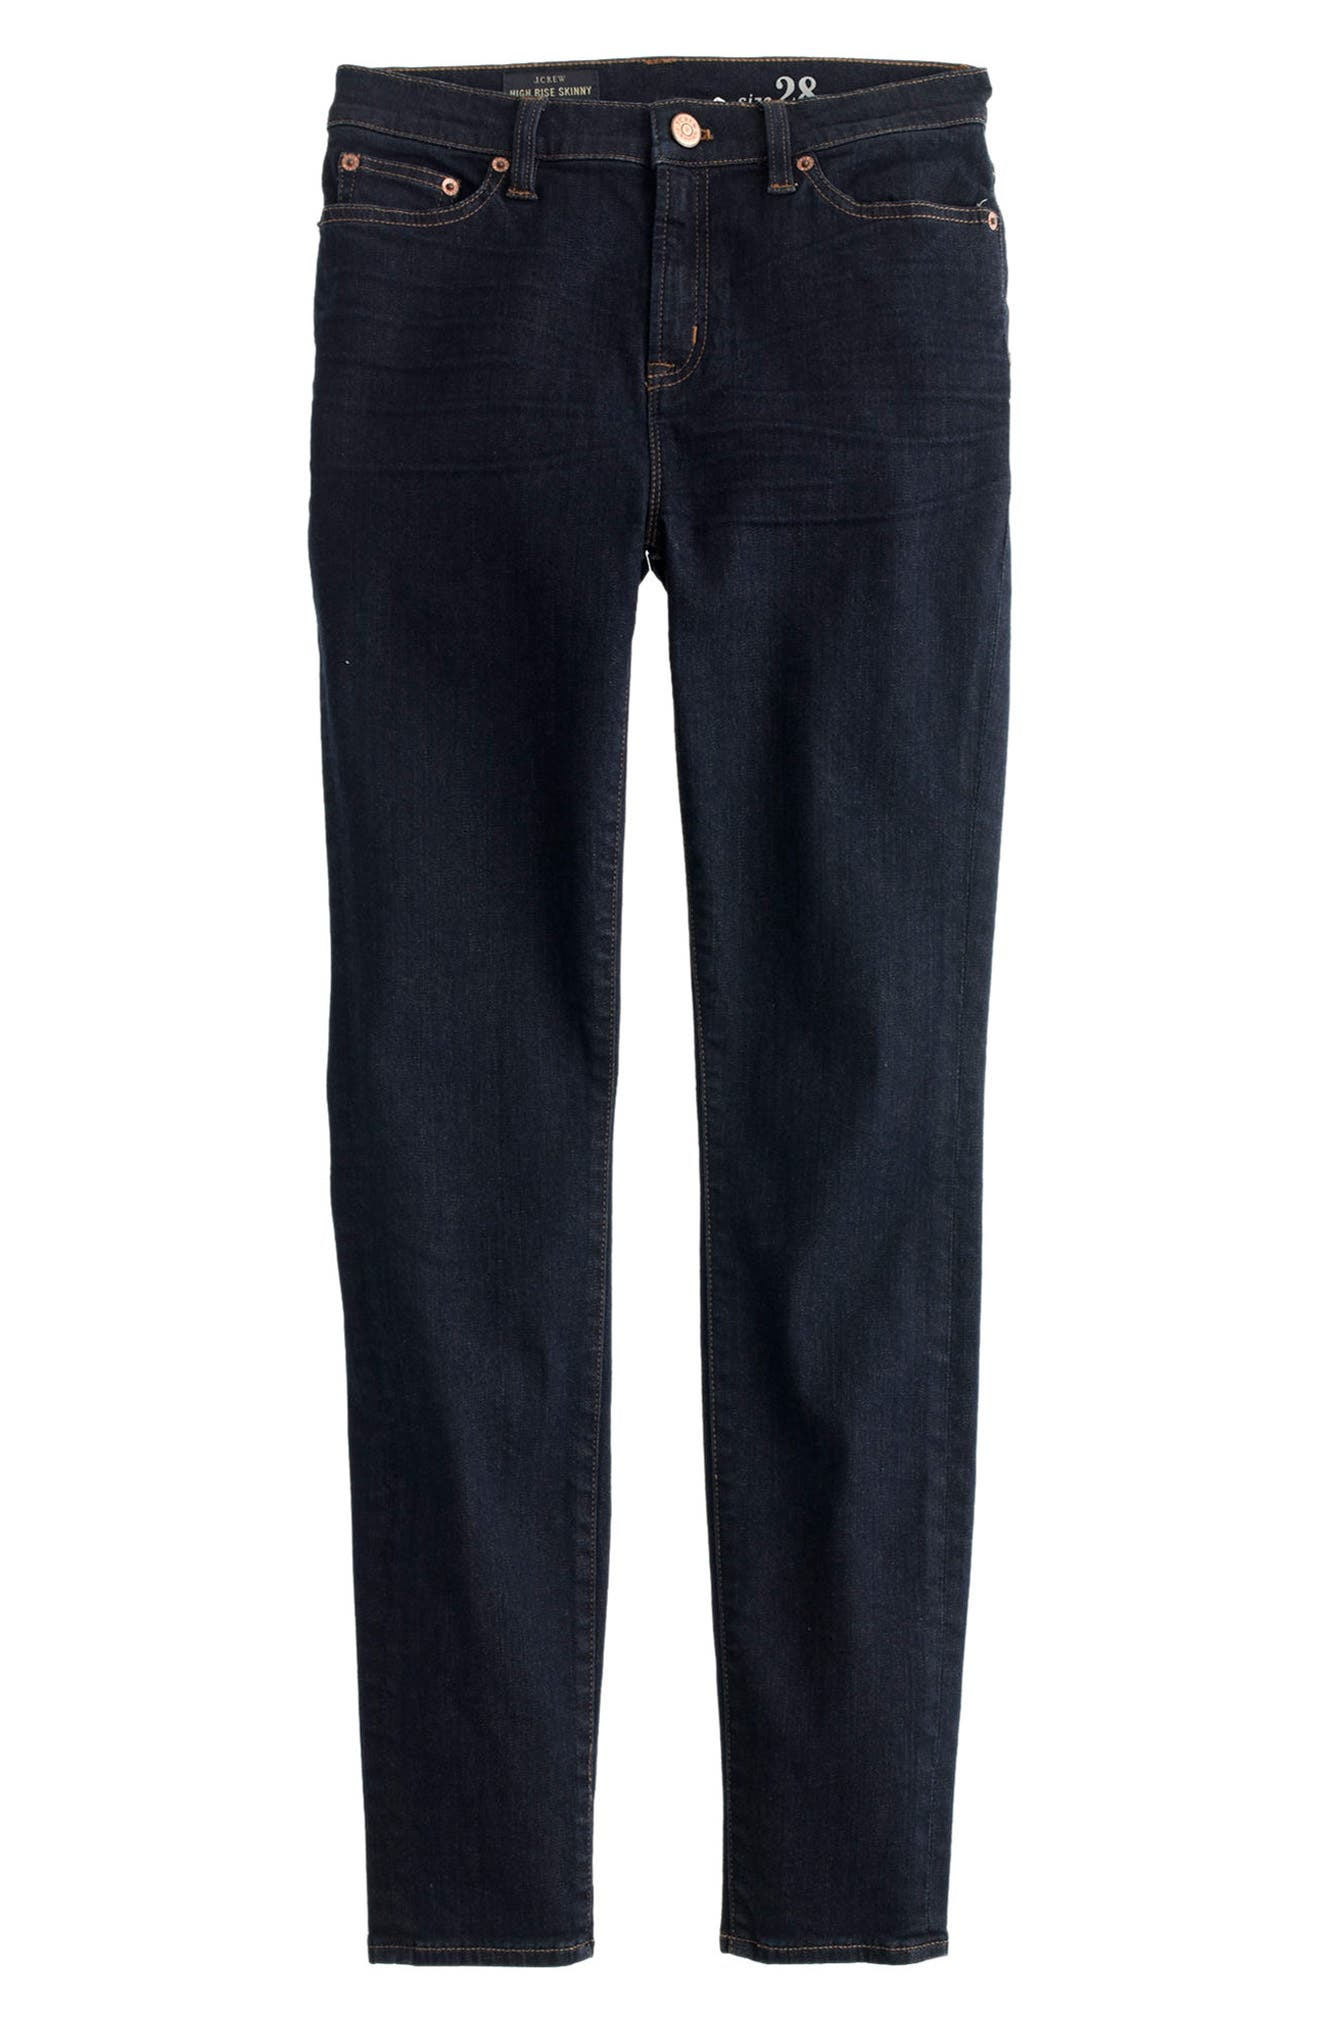 Lookout High Rise Jeans,                             Alternate thumbnail 3, color,                             400